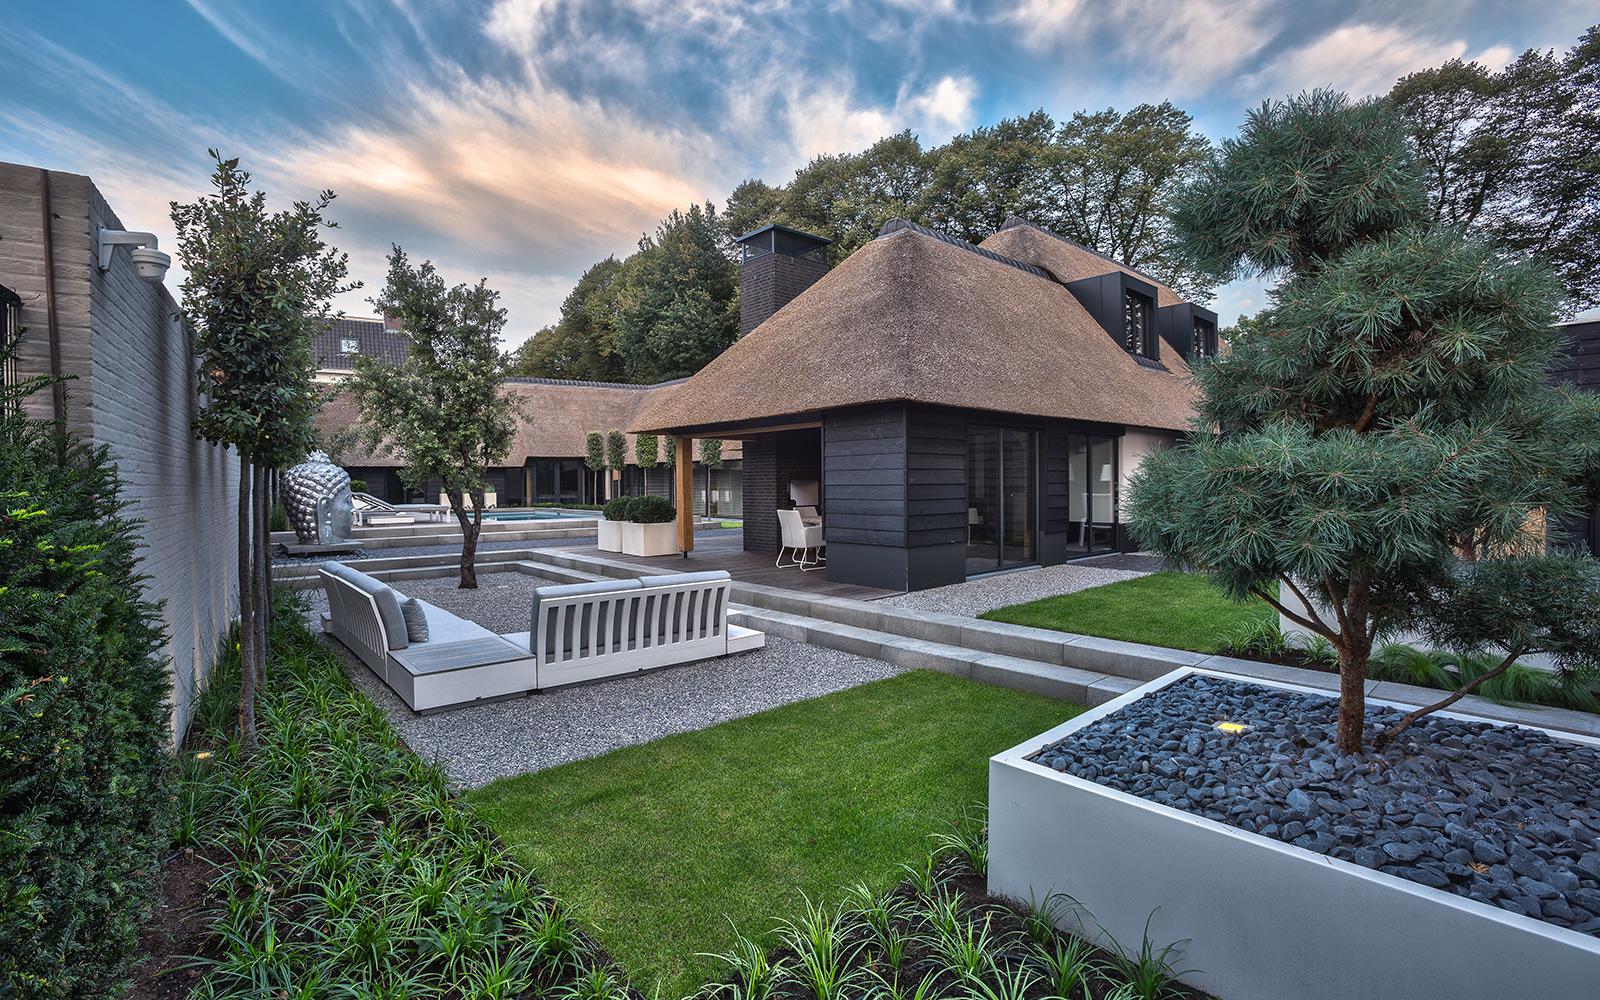 exclusieve villatuin, knops tuindesign, tuinontwerp, luxe tuin